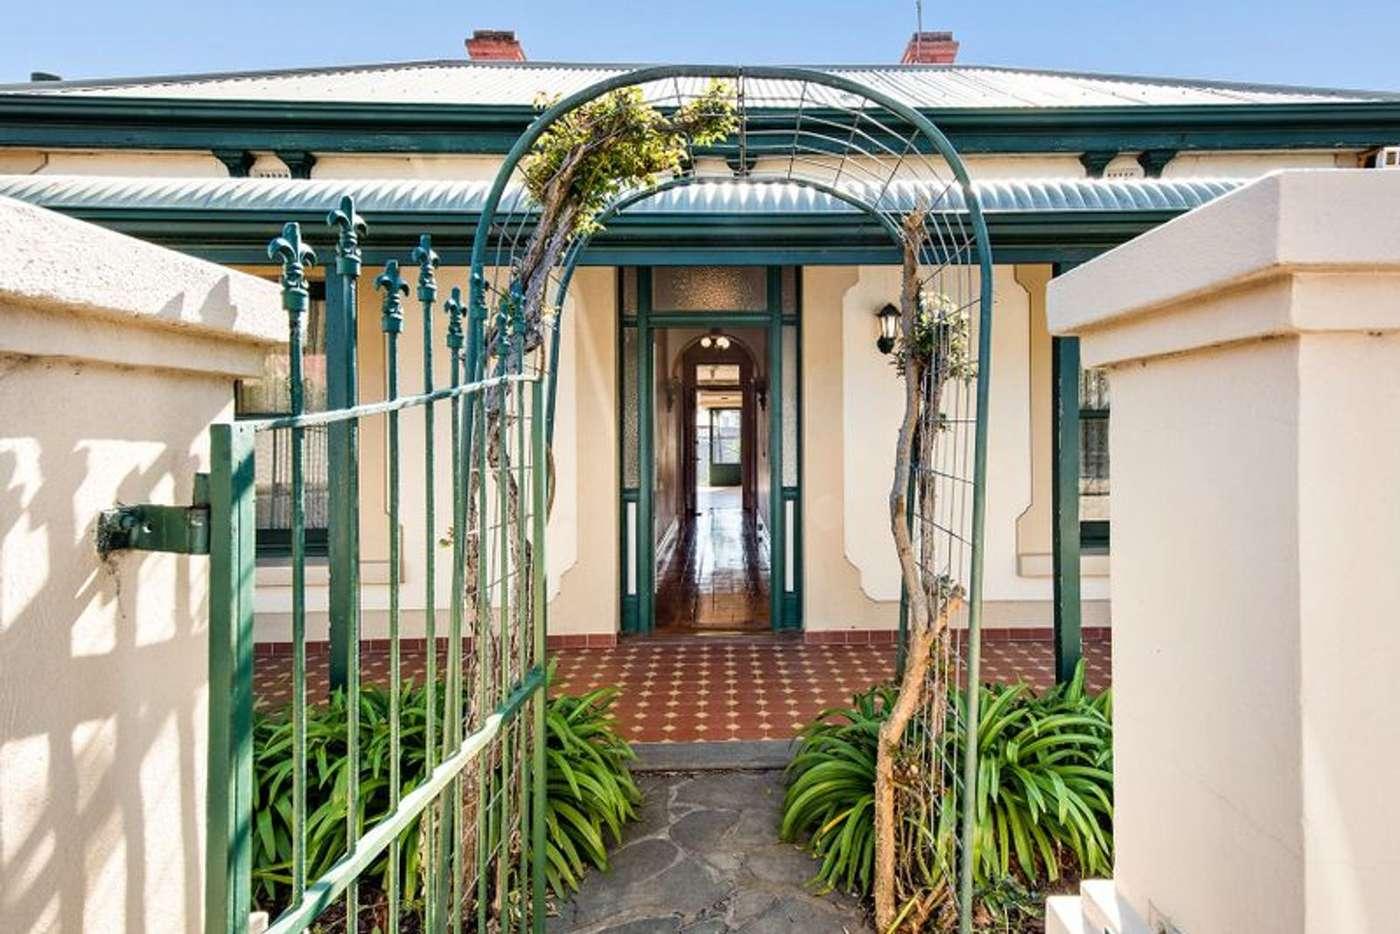 Main view of Homely house listing, 5 Fulton Street, Glenelg North SA 5045